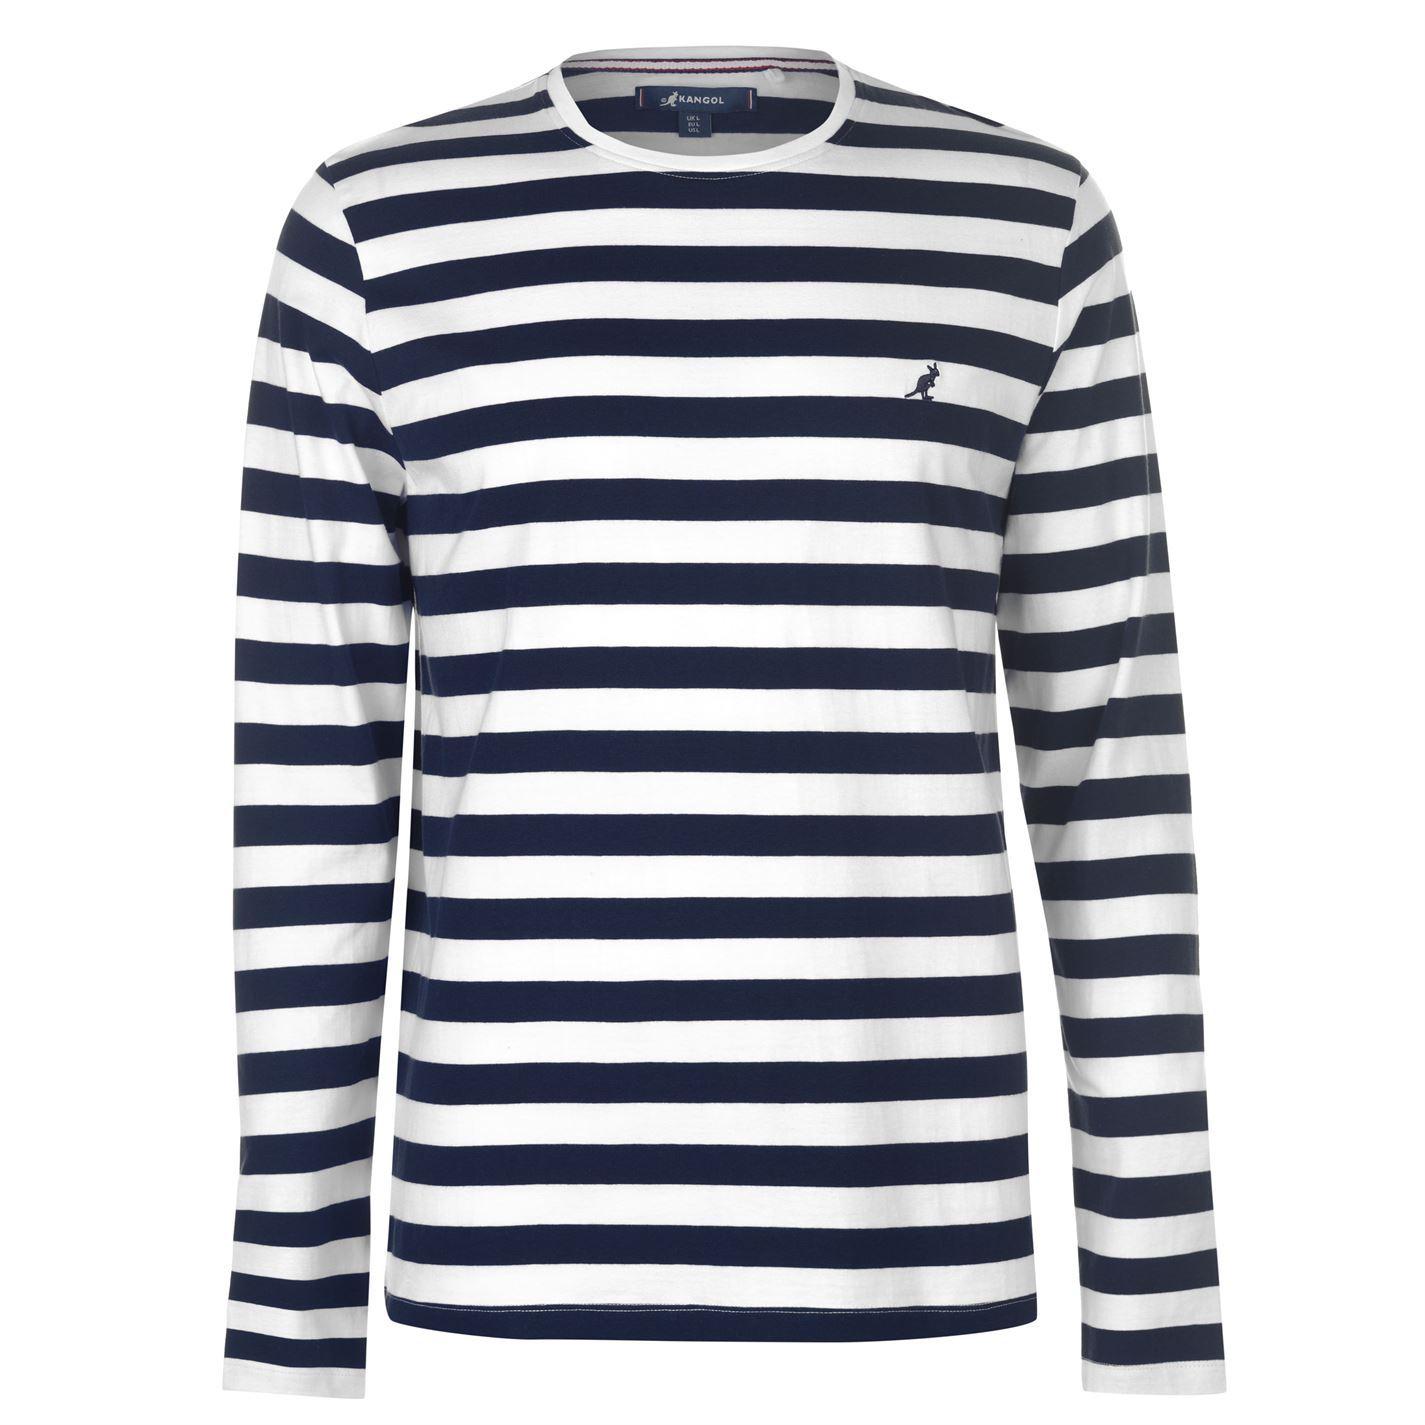 Kangol-Long-Sleeve-T-Shirt-Mens-Tee-Shirt-Top thumbnail 8